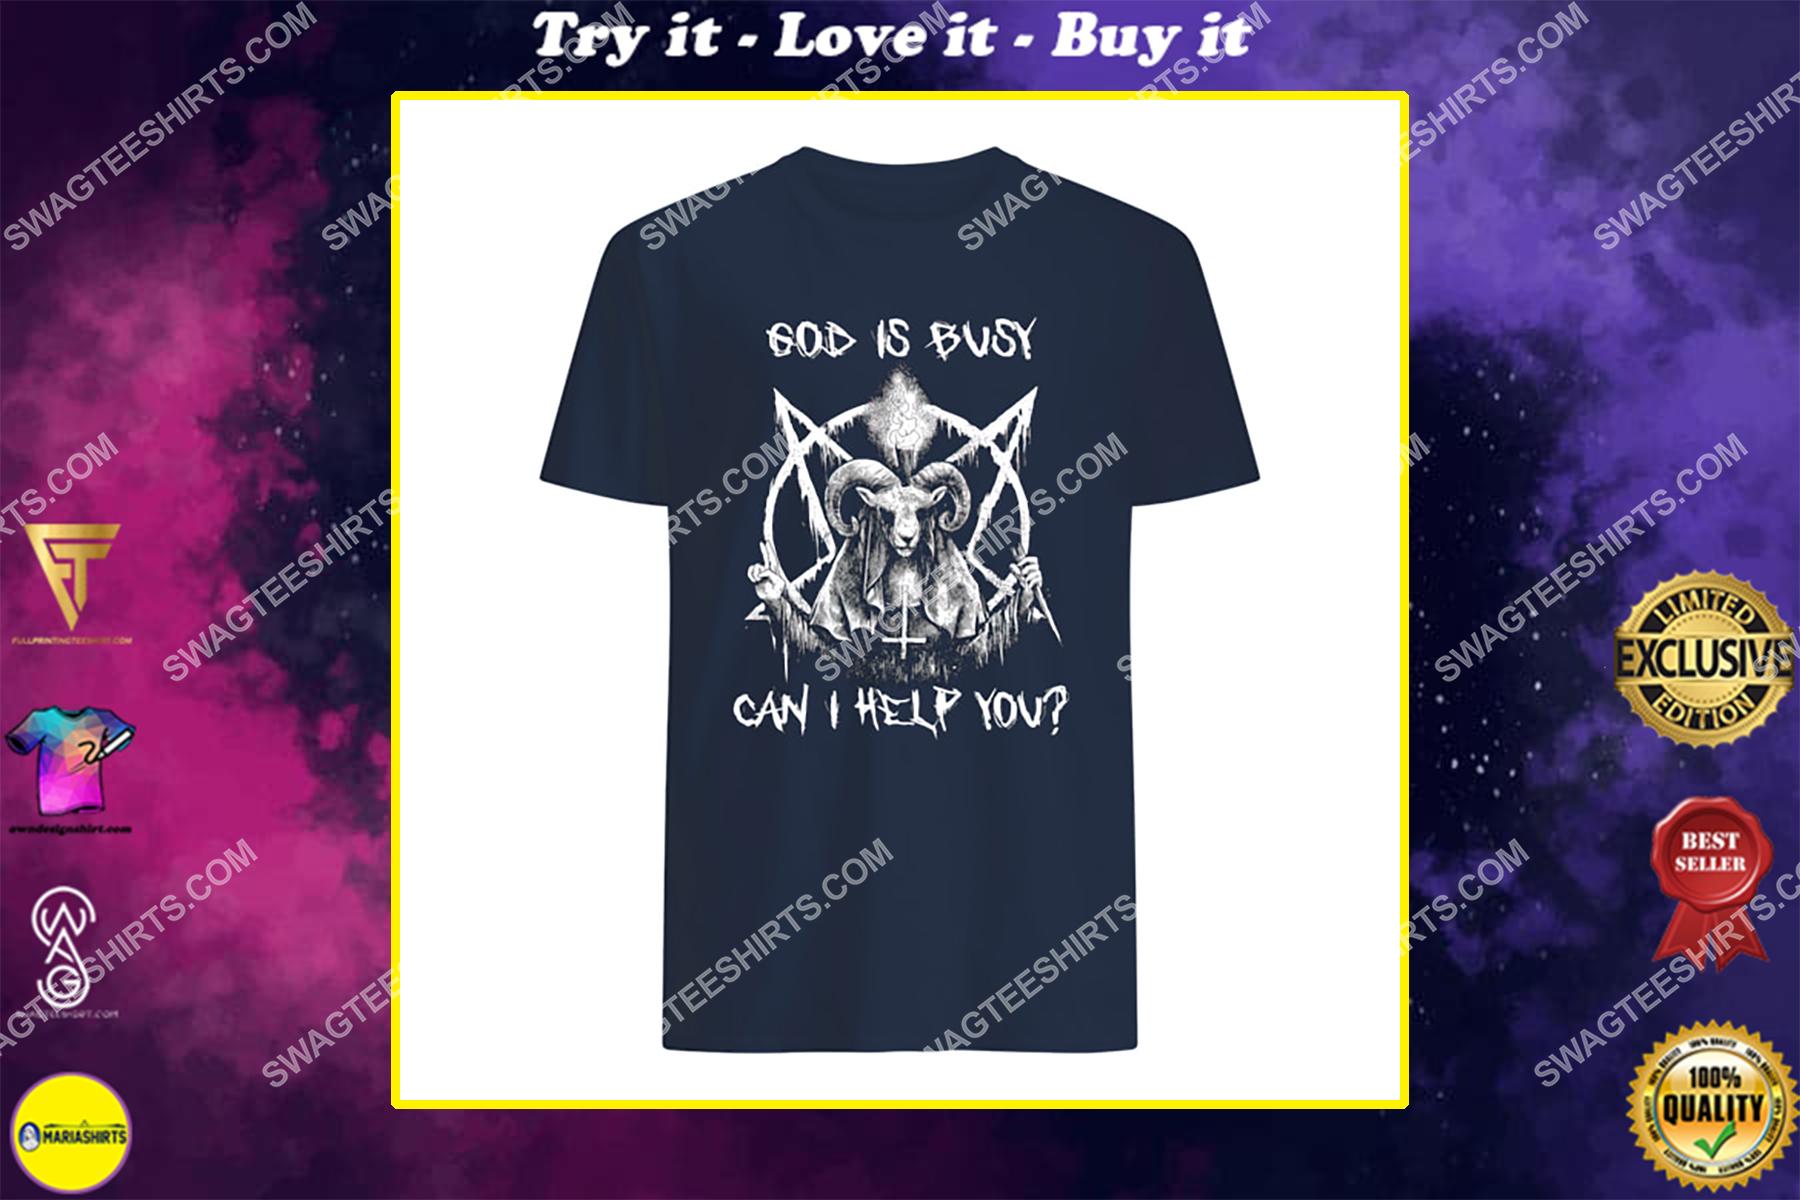 God is busy can i help you satanic halloween shirt